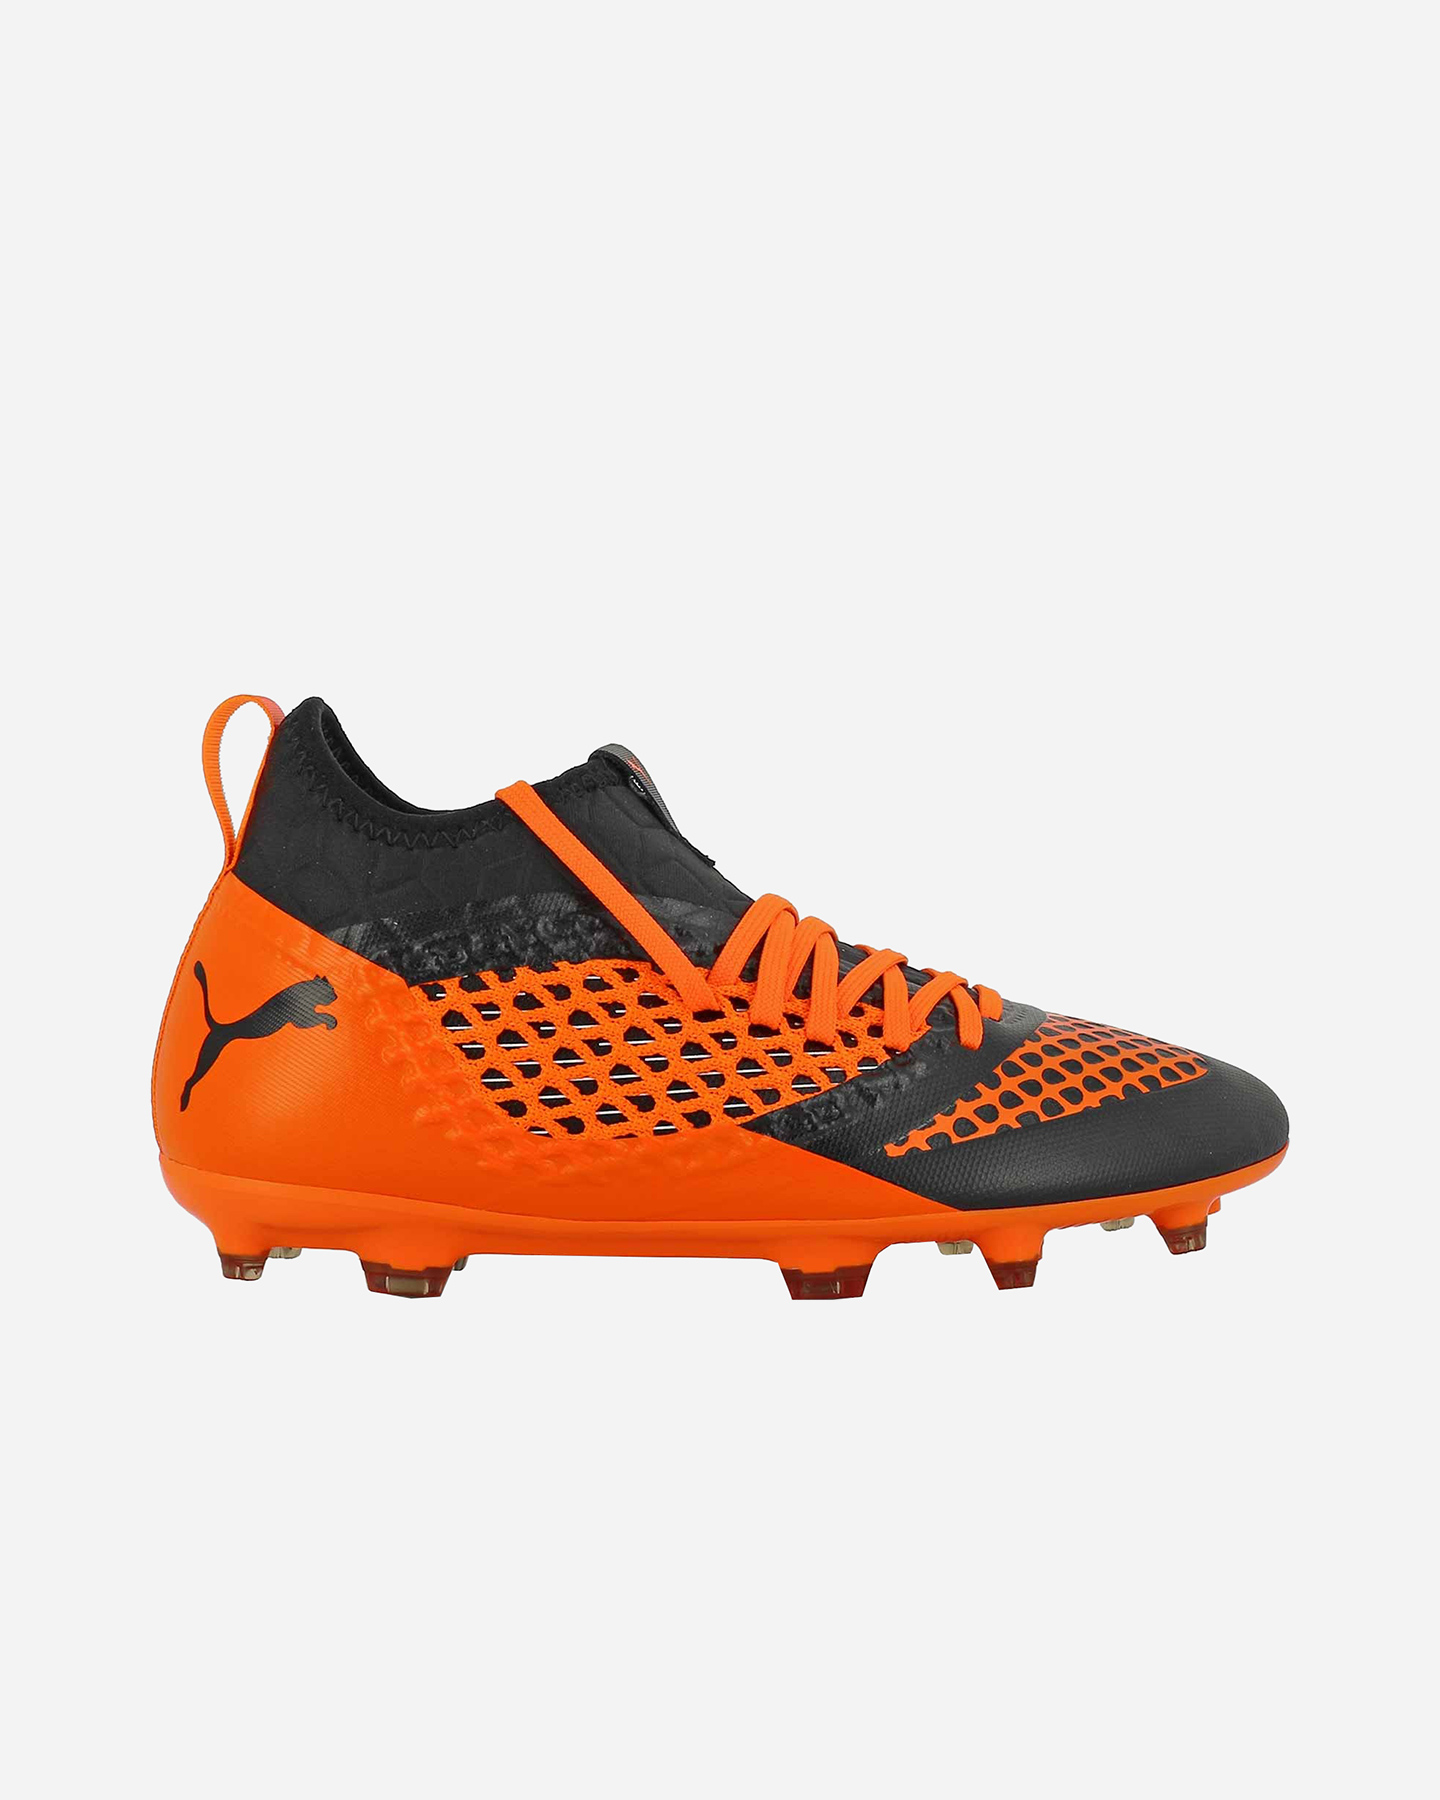 104836 Cisalfa Fgag 2 Scarpe Future Calcio 02 Jr Su Puma 3 Netfit wYRPWq